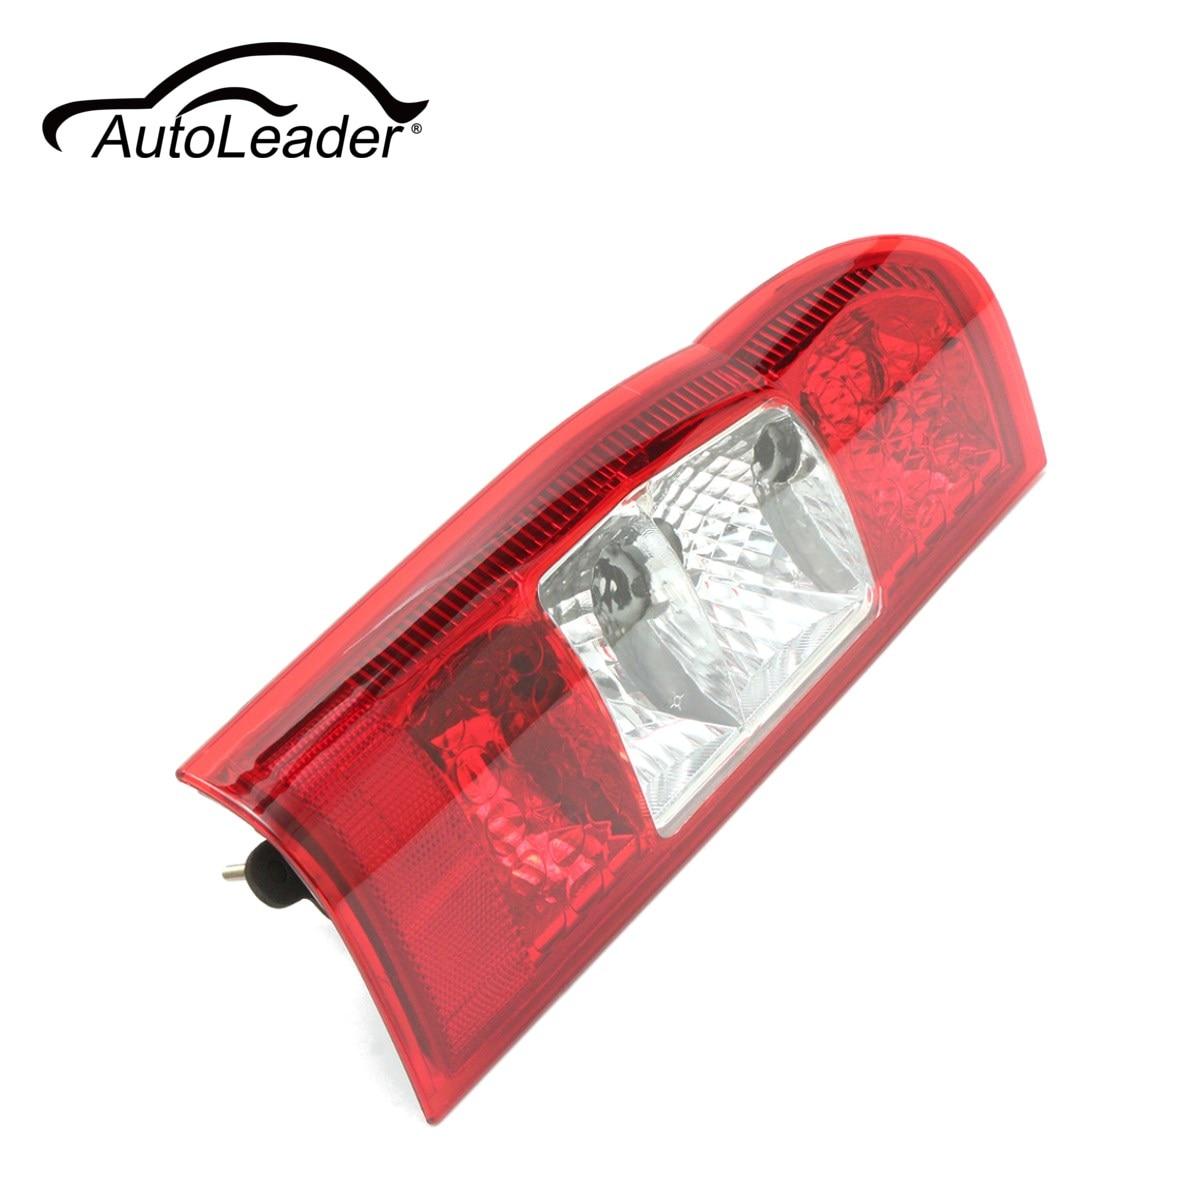 Autoleader car led tail left rear bumper reflector lamp brake light rear fog lights for ford